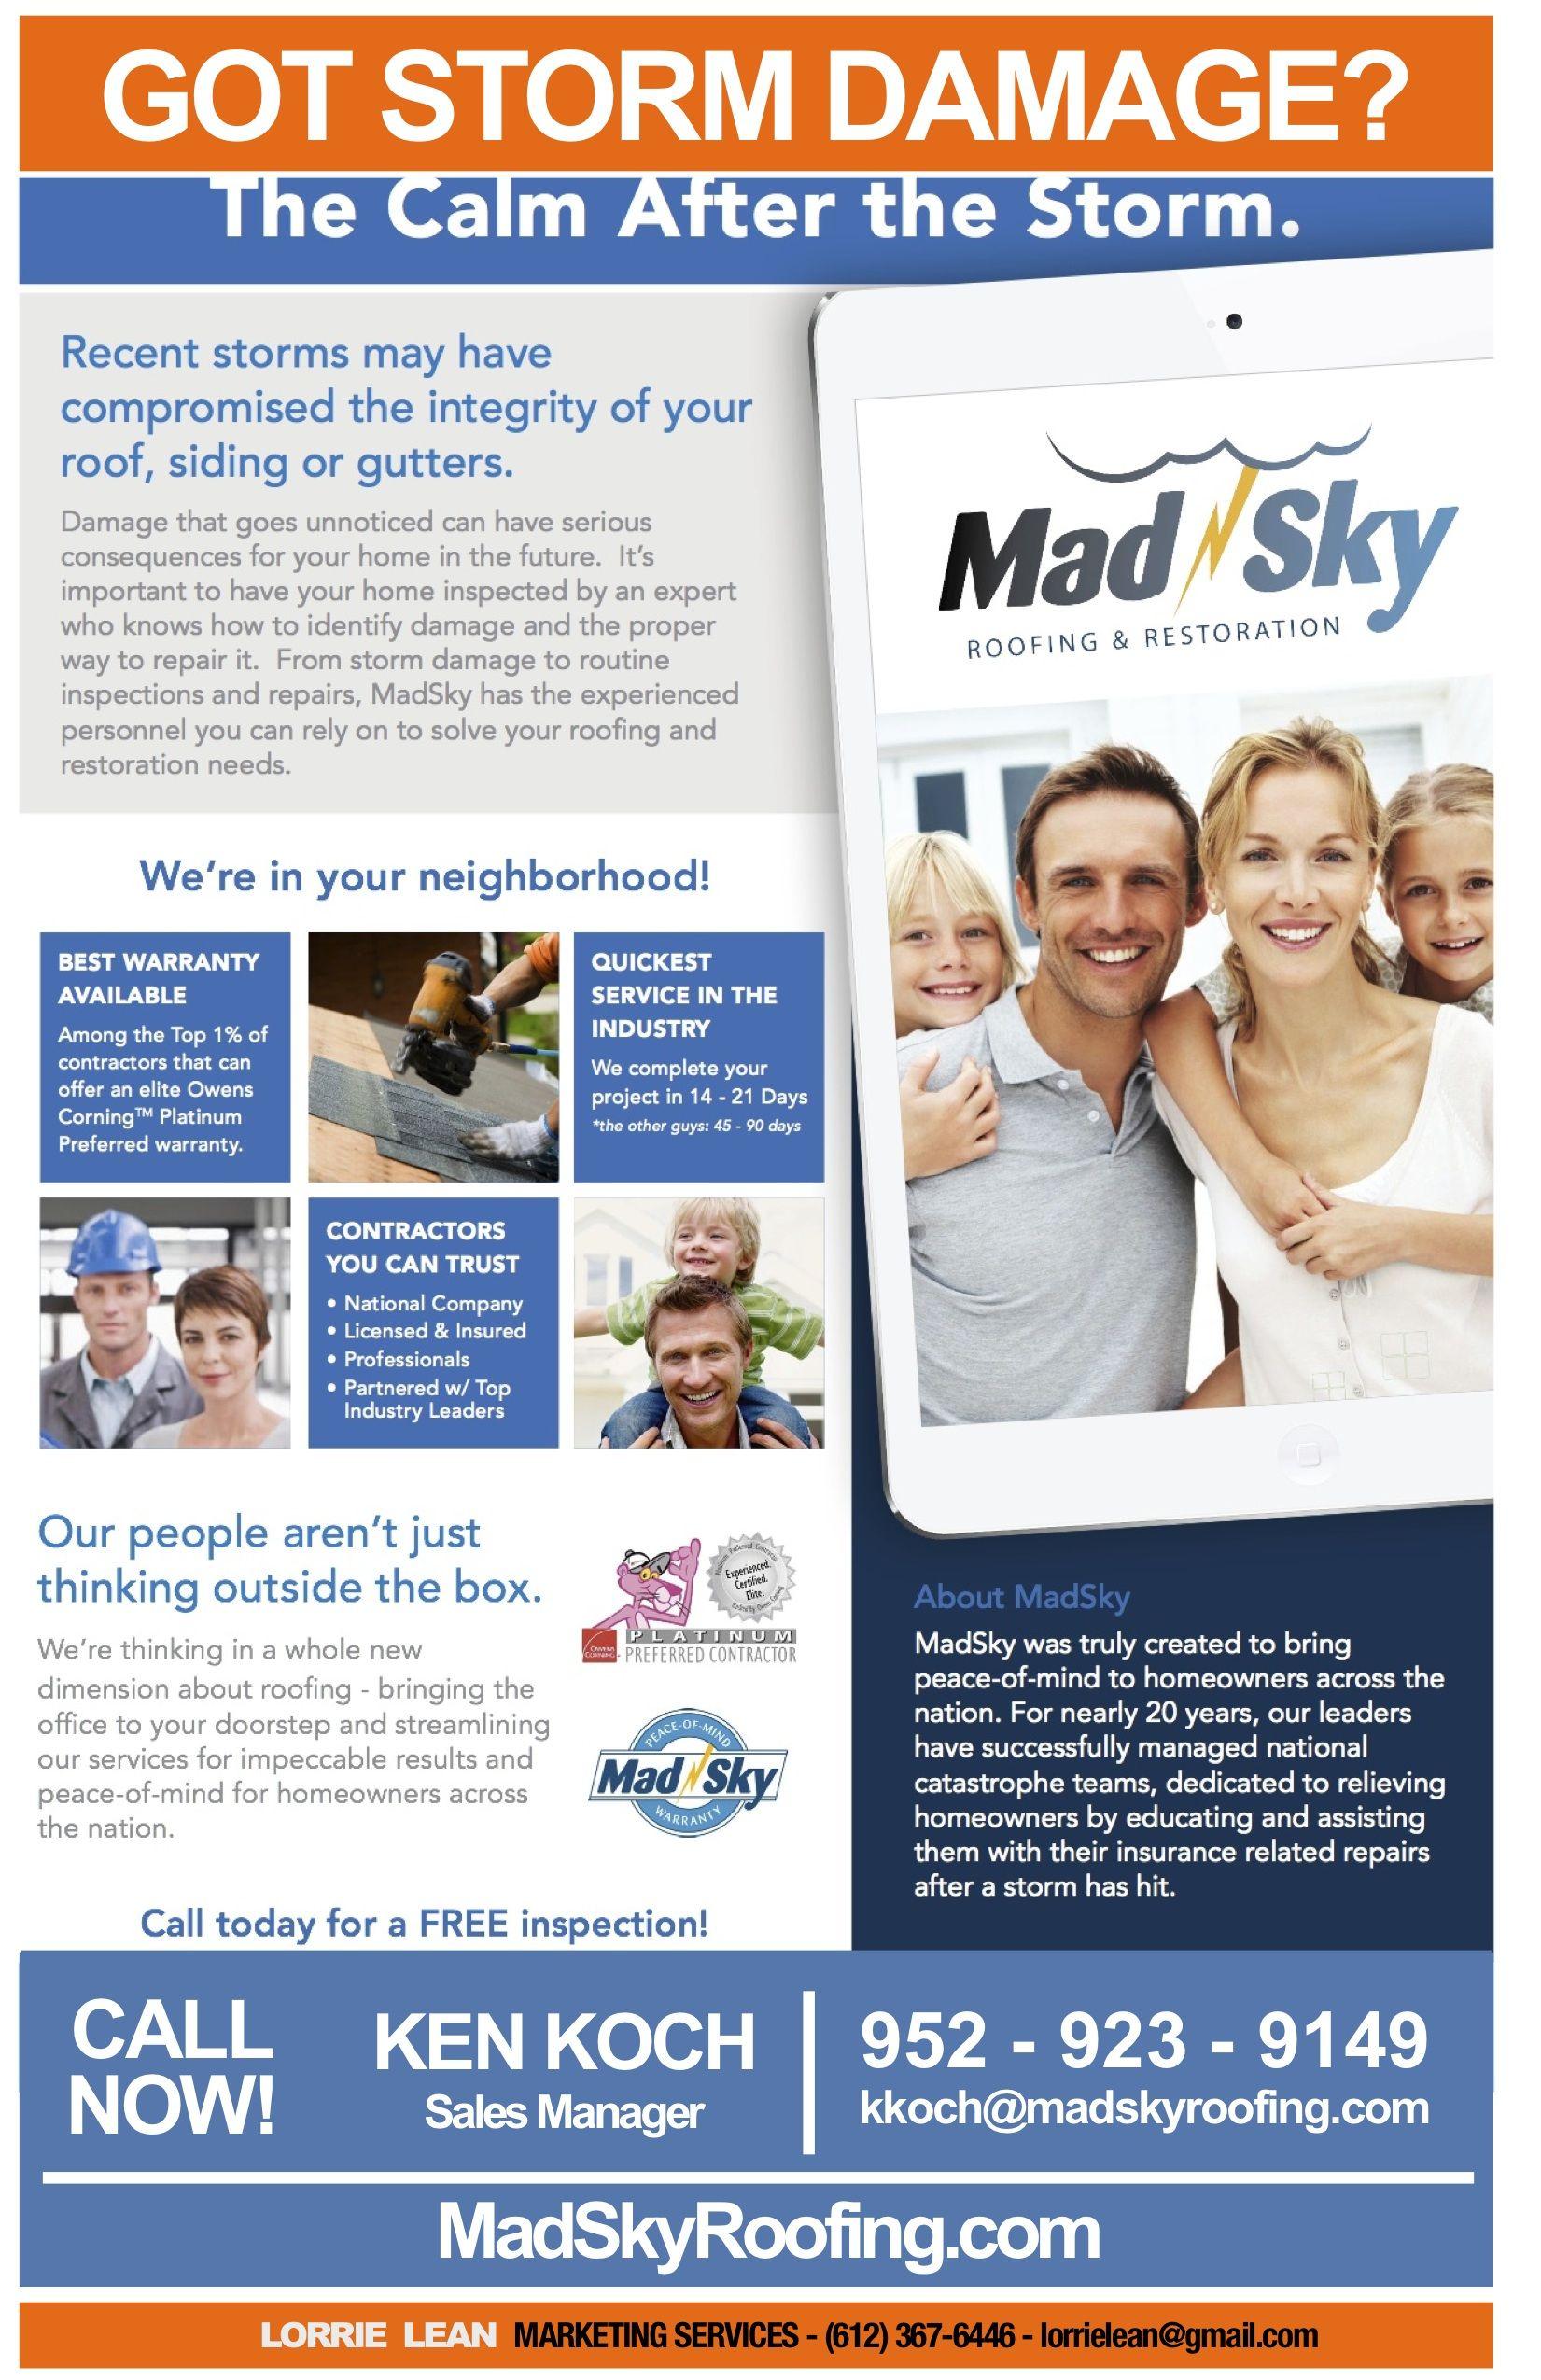 Got Storm Damage Call Ken Koch 9529239149 For A Free Inspection Calm After The Storm Storm Gutters